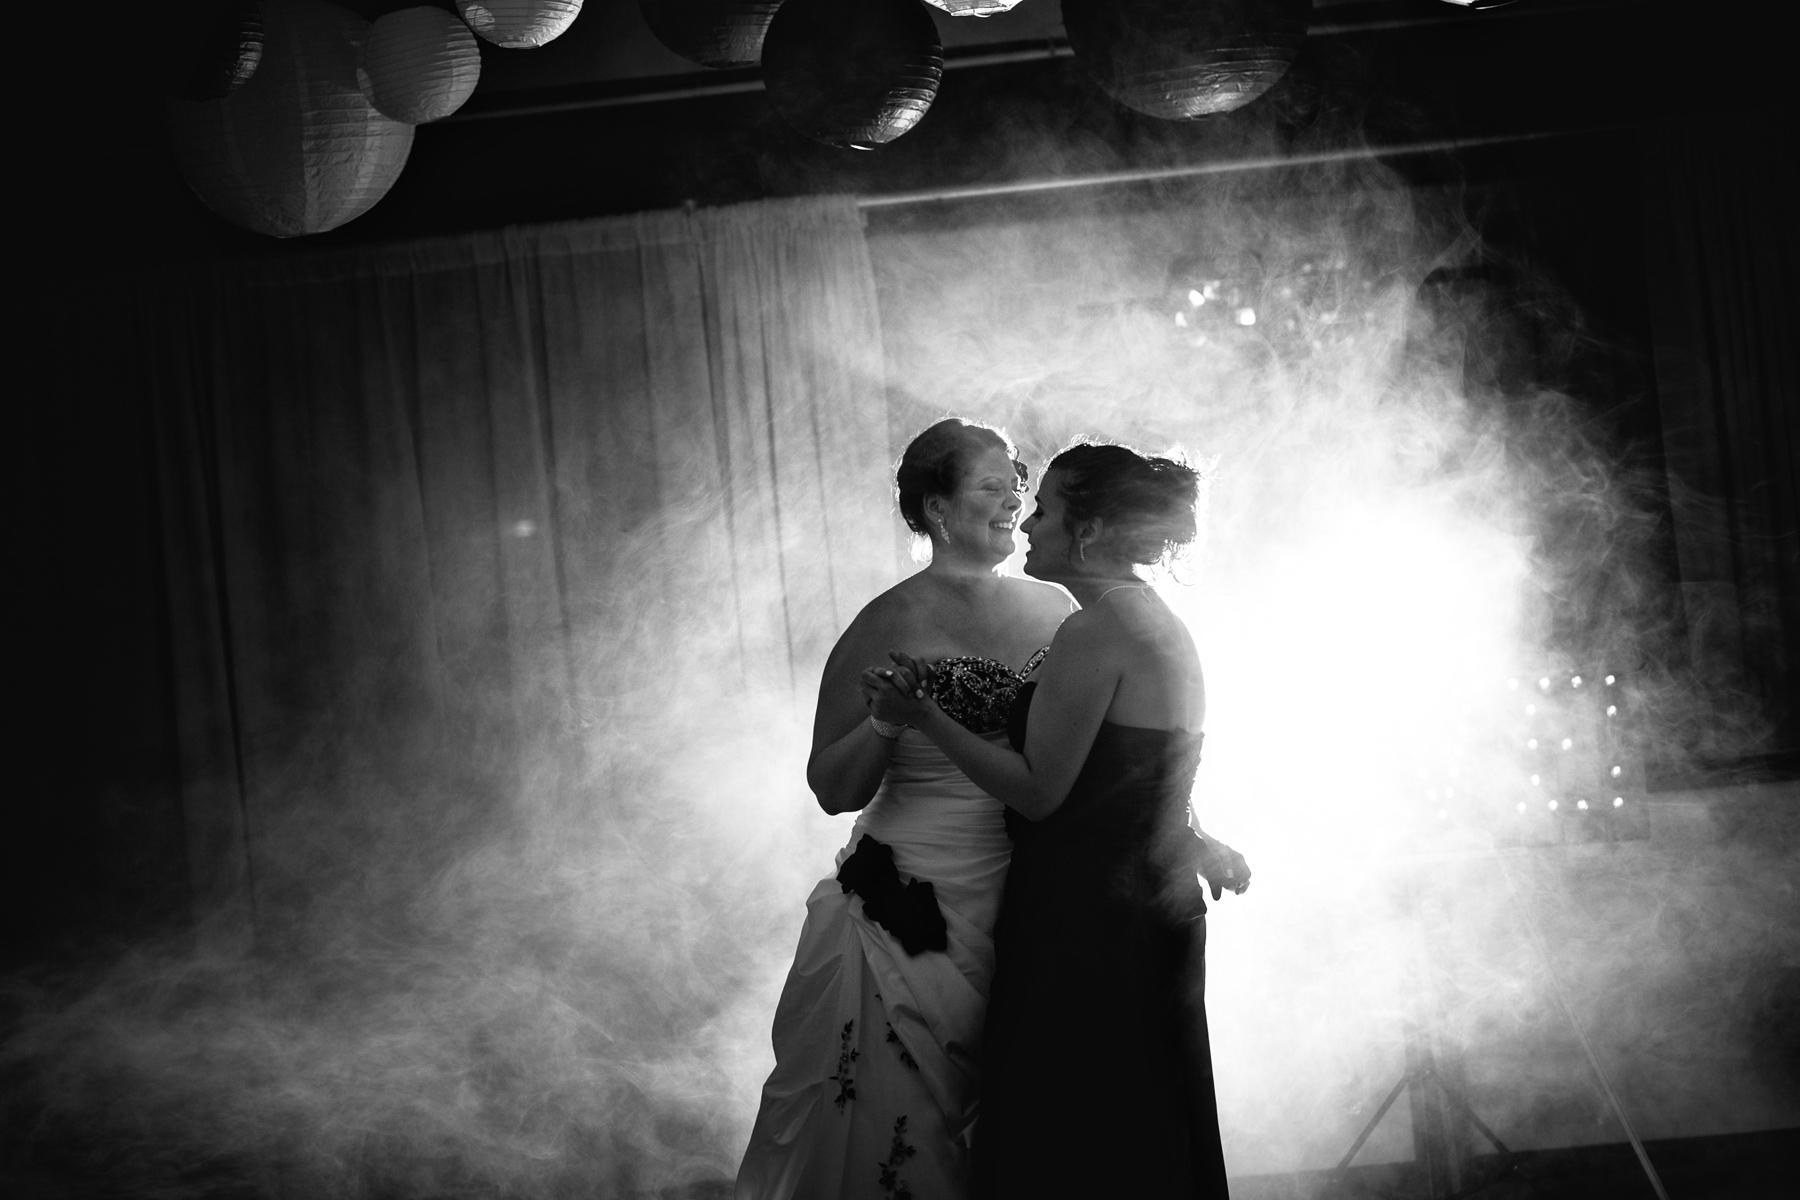 082-awesome-joggins-fossil-wedding-nova-scotia-kandisebrown-jl2016